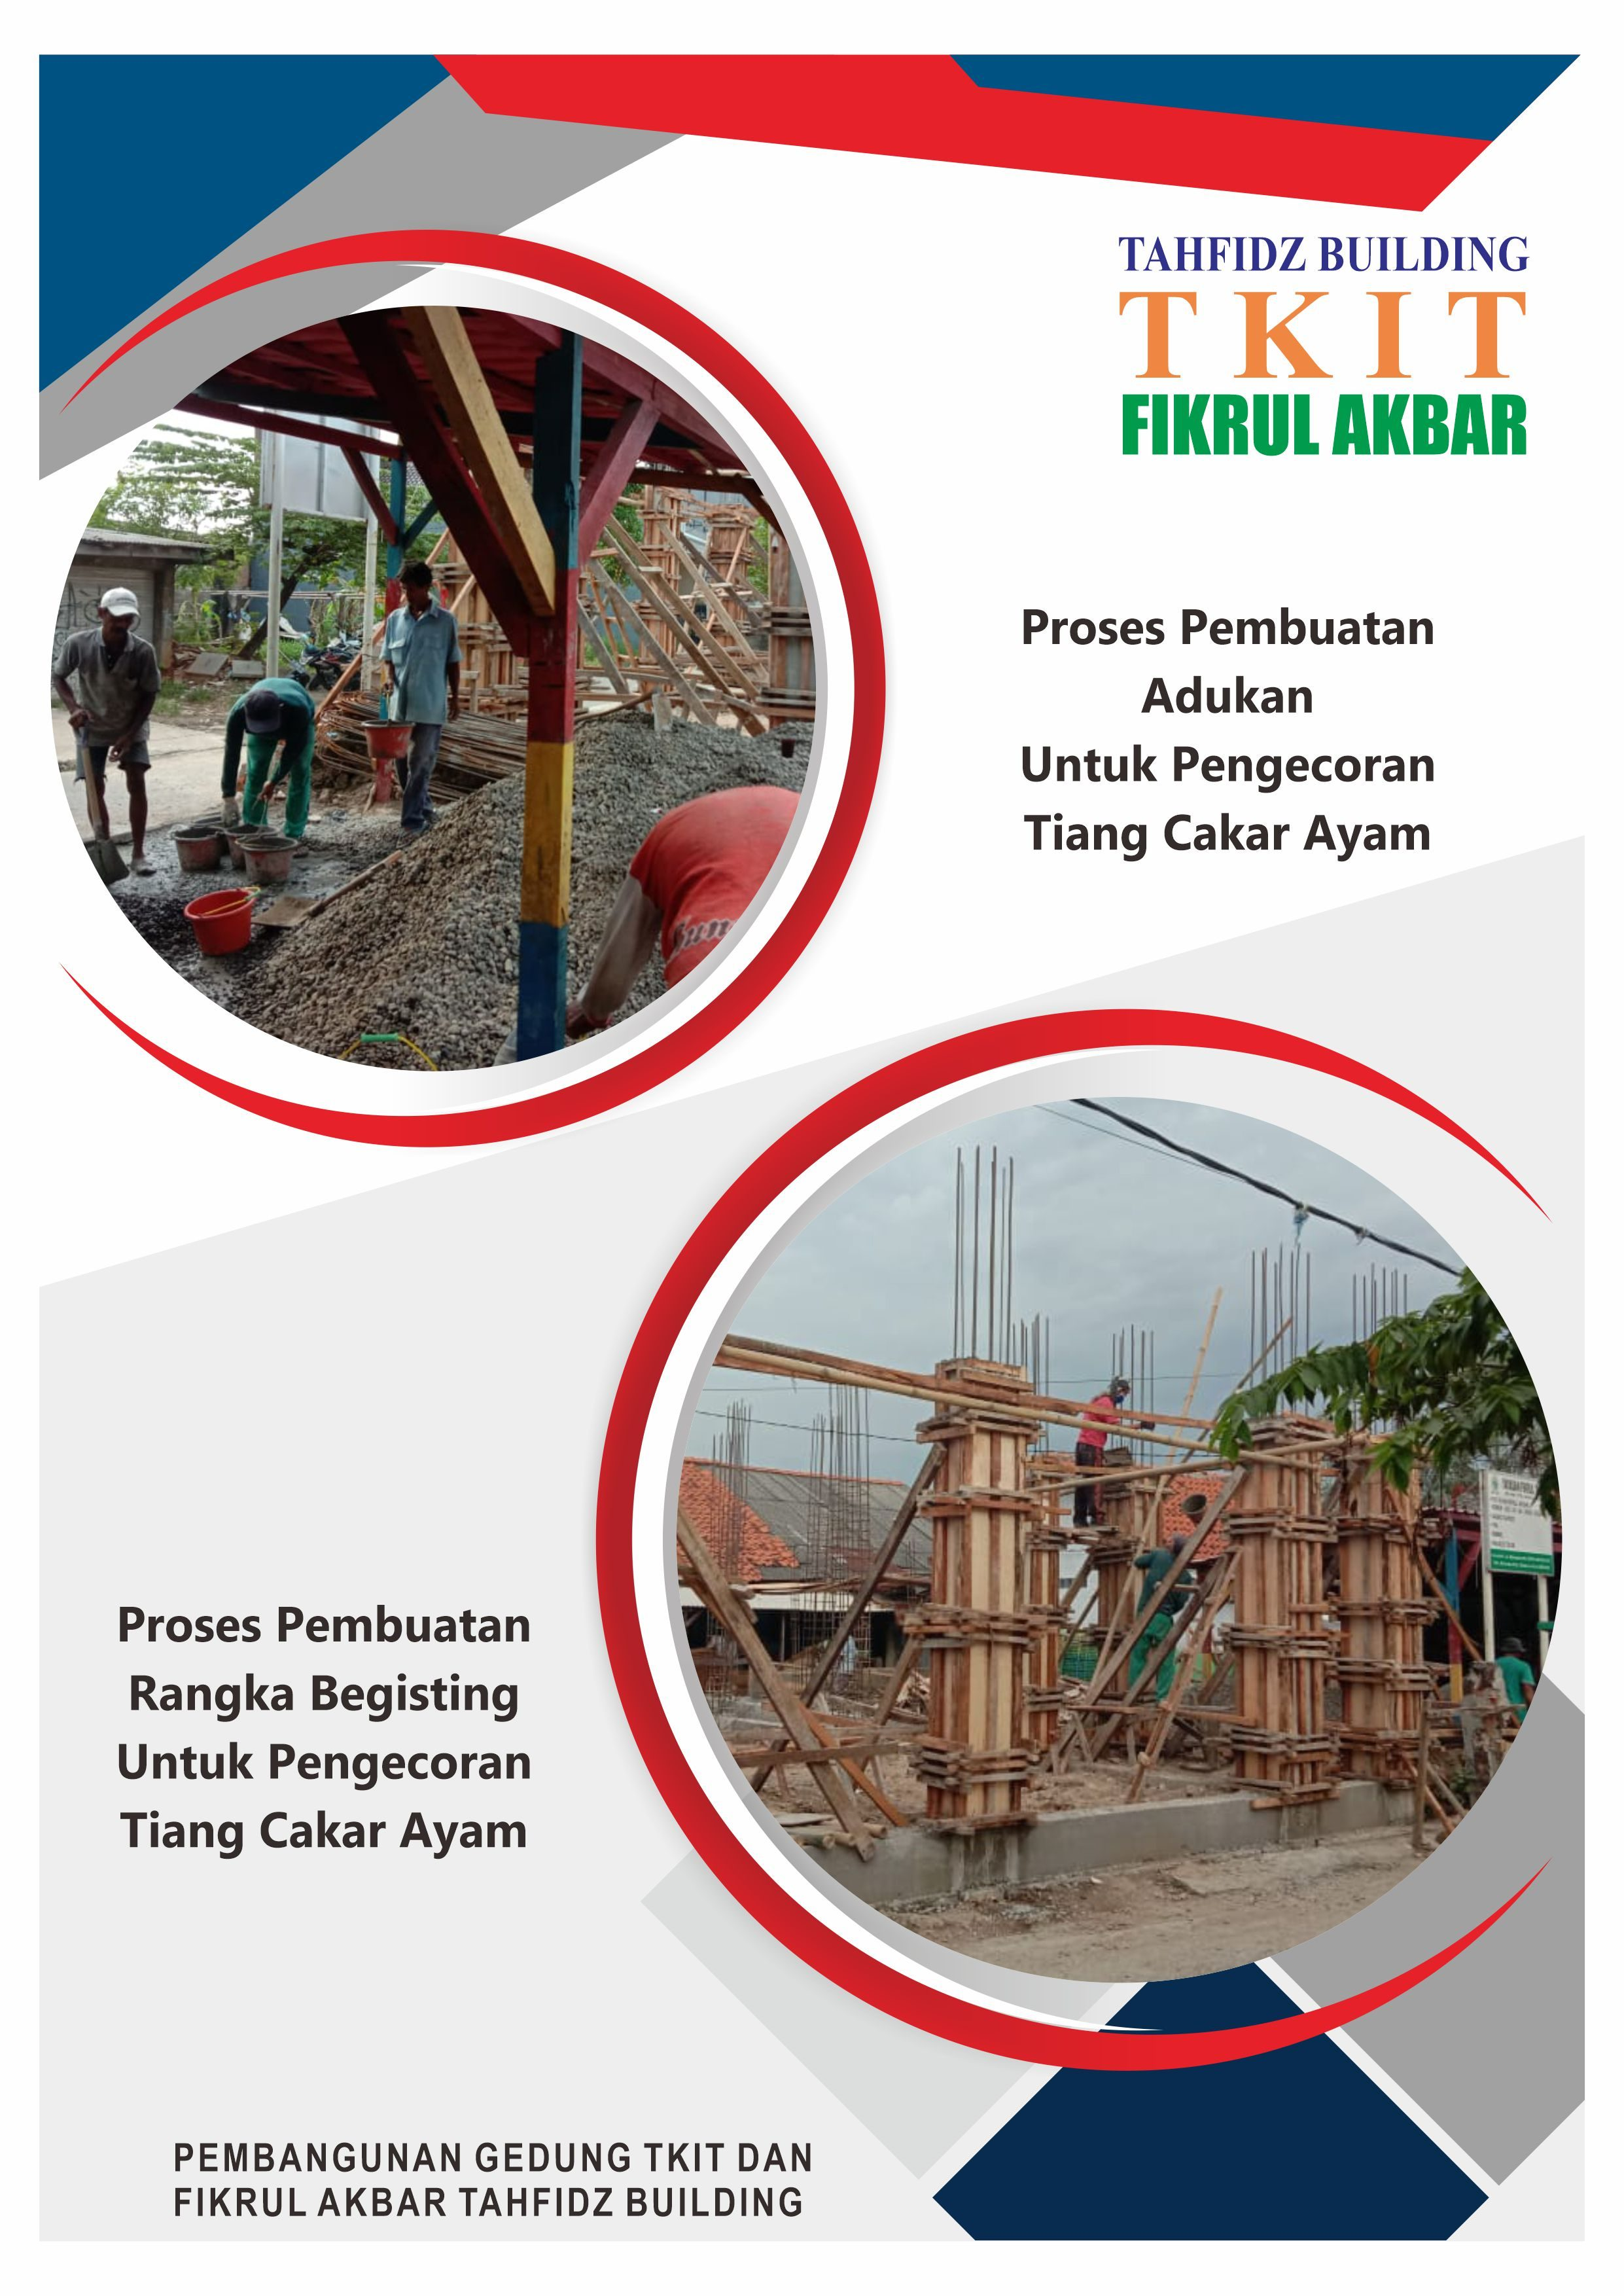 Proses Pengecoran Tiang Cakar Ayam Tahfidz Building TKIT Fikrul Akbar